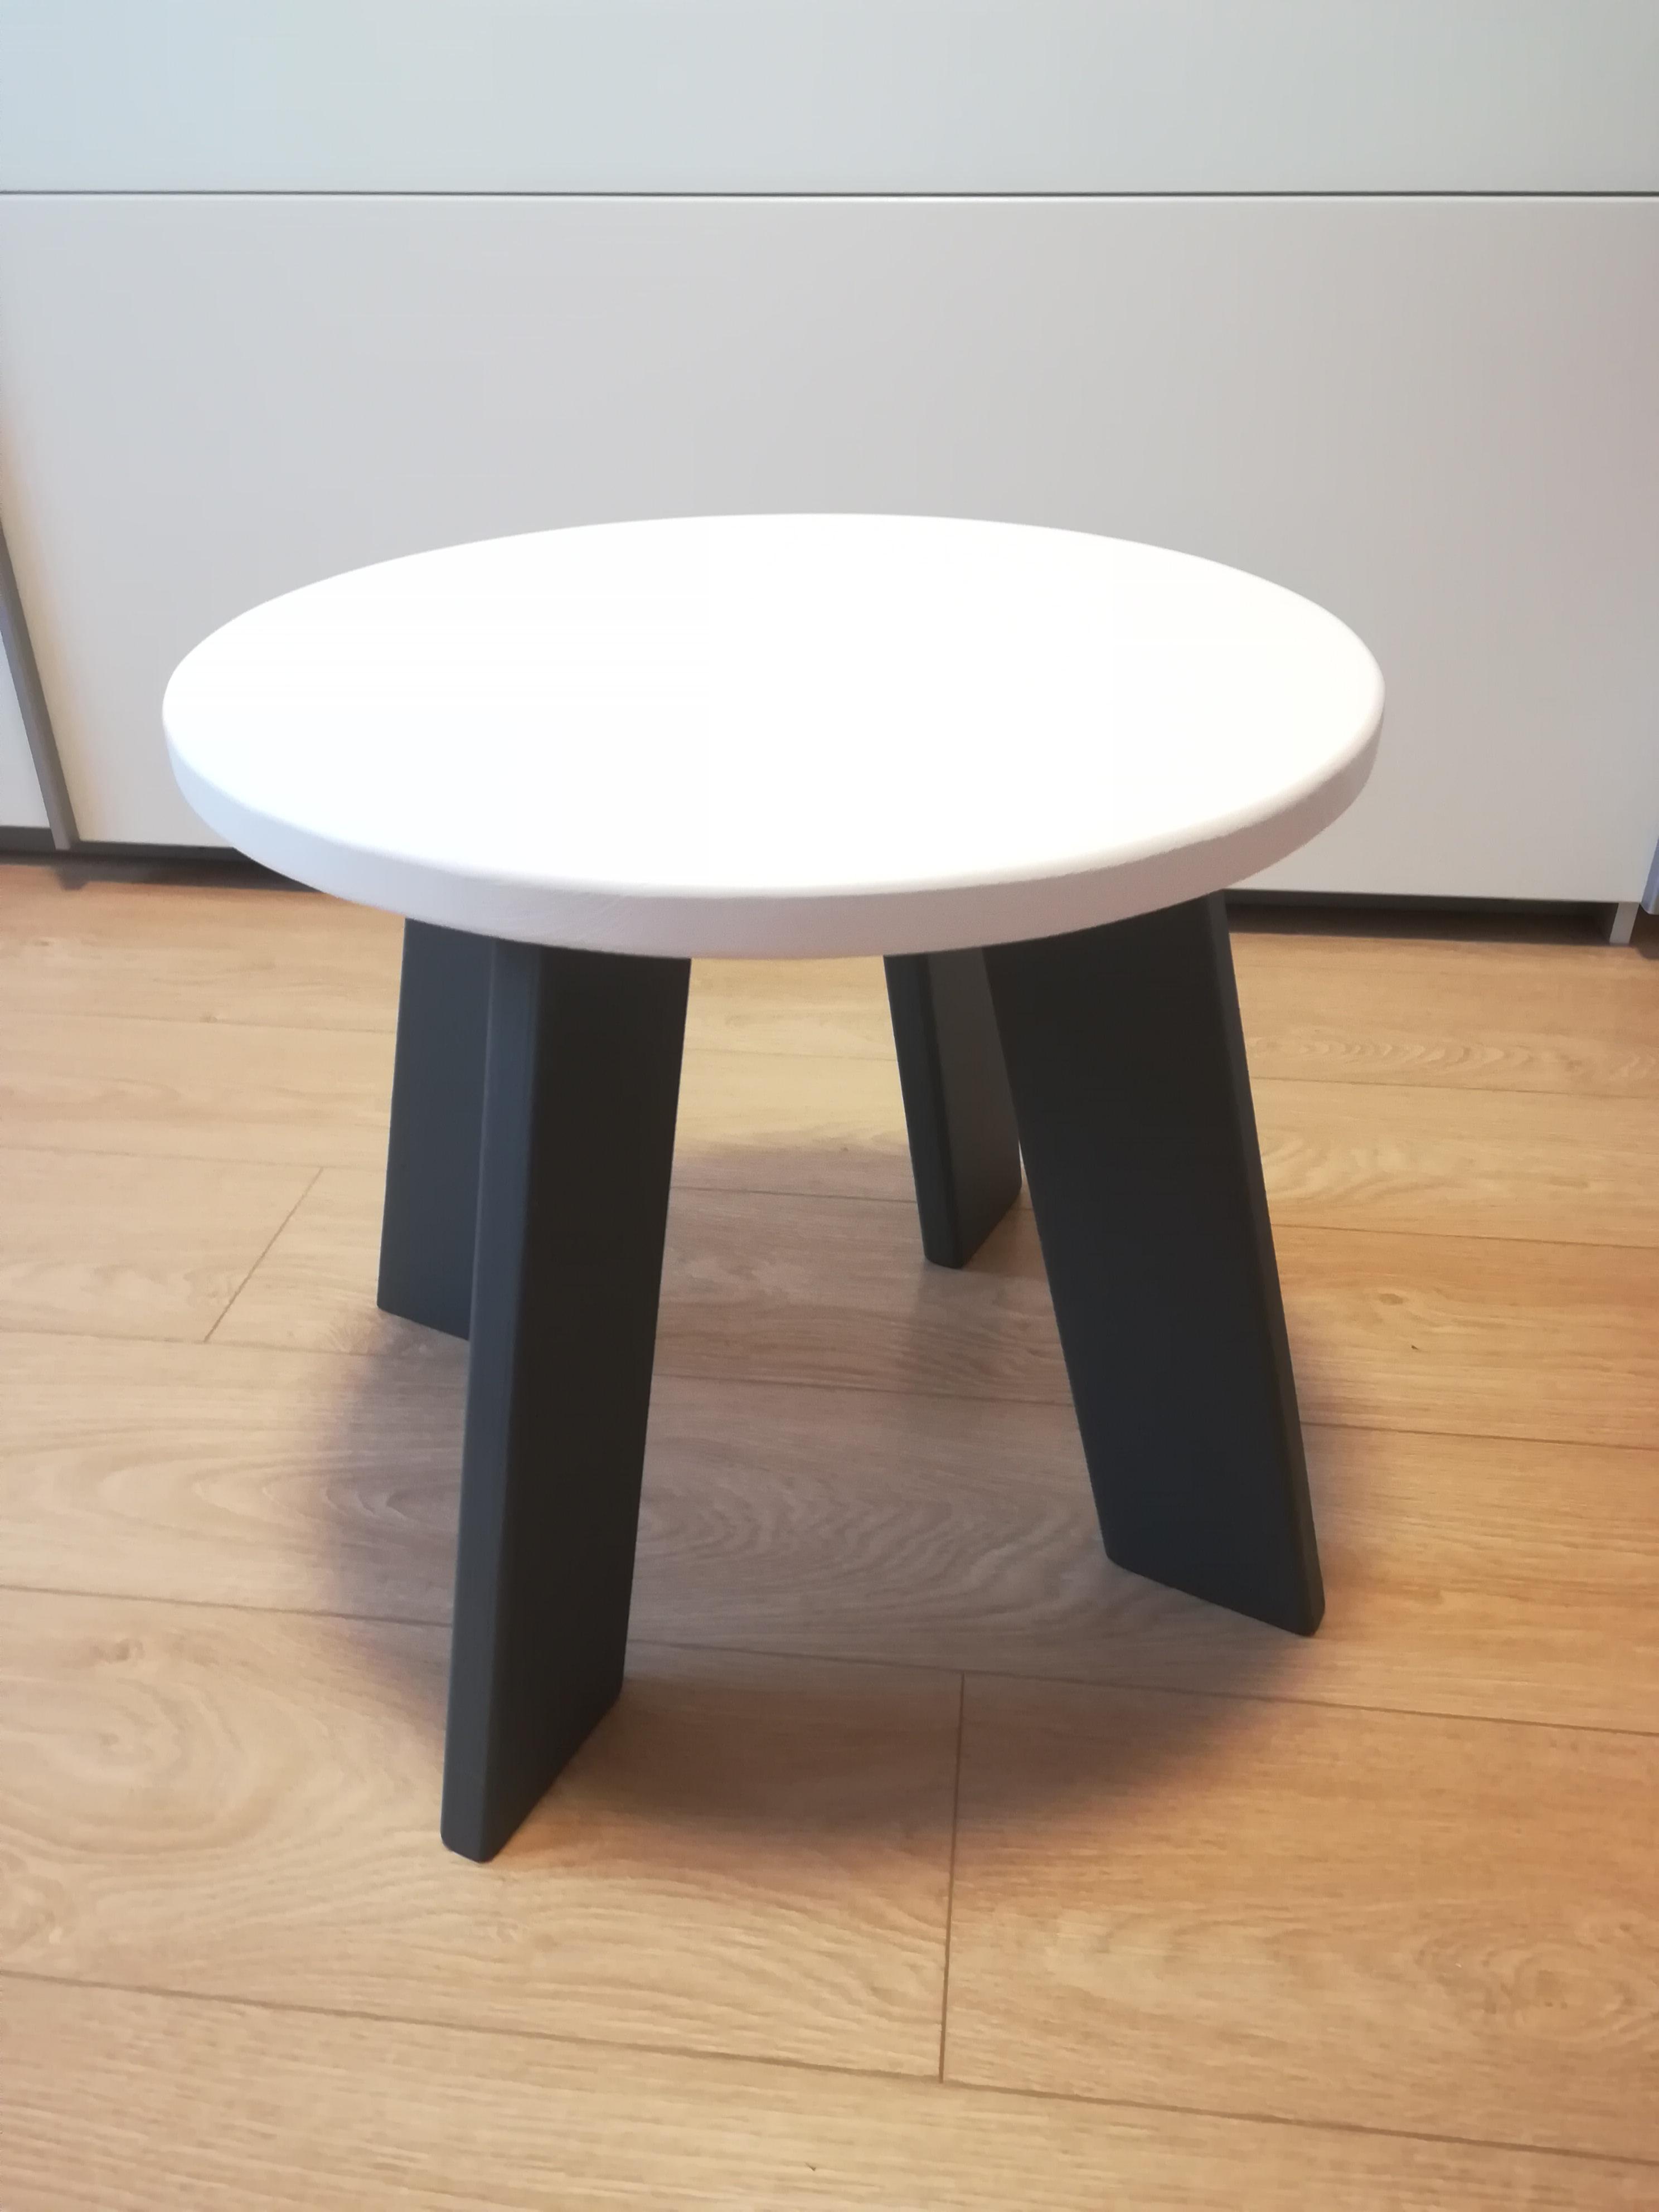 cb69ac6fd764 Stolík Zajko - originalnevecicky.sk detský drevený stolík